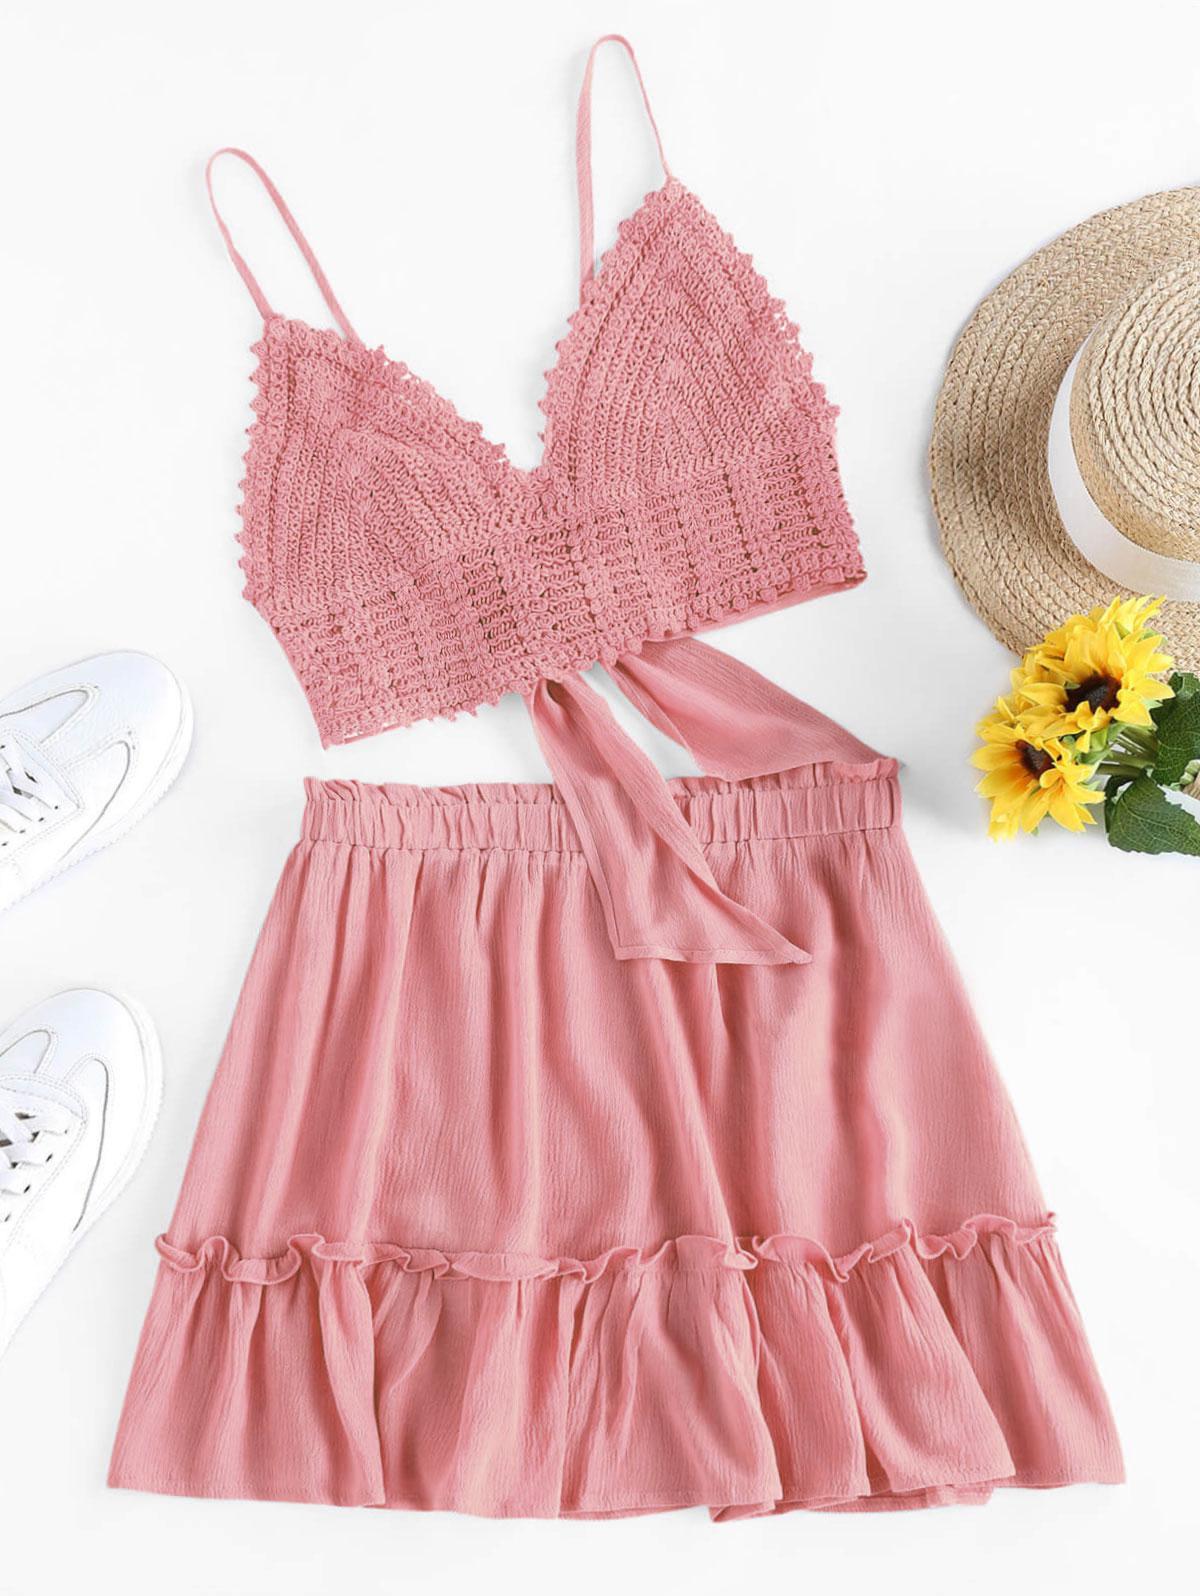 ZAFUL Crochet Tie Back Frill Skirt Set